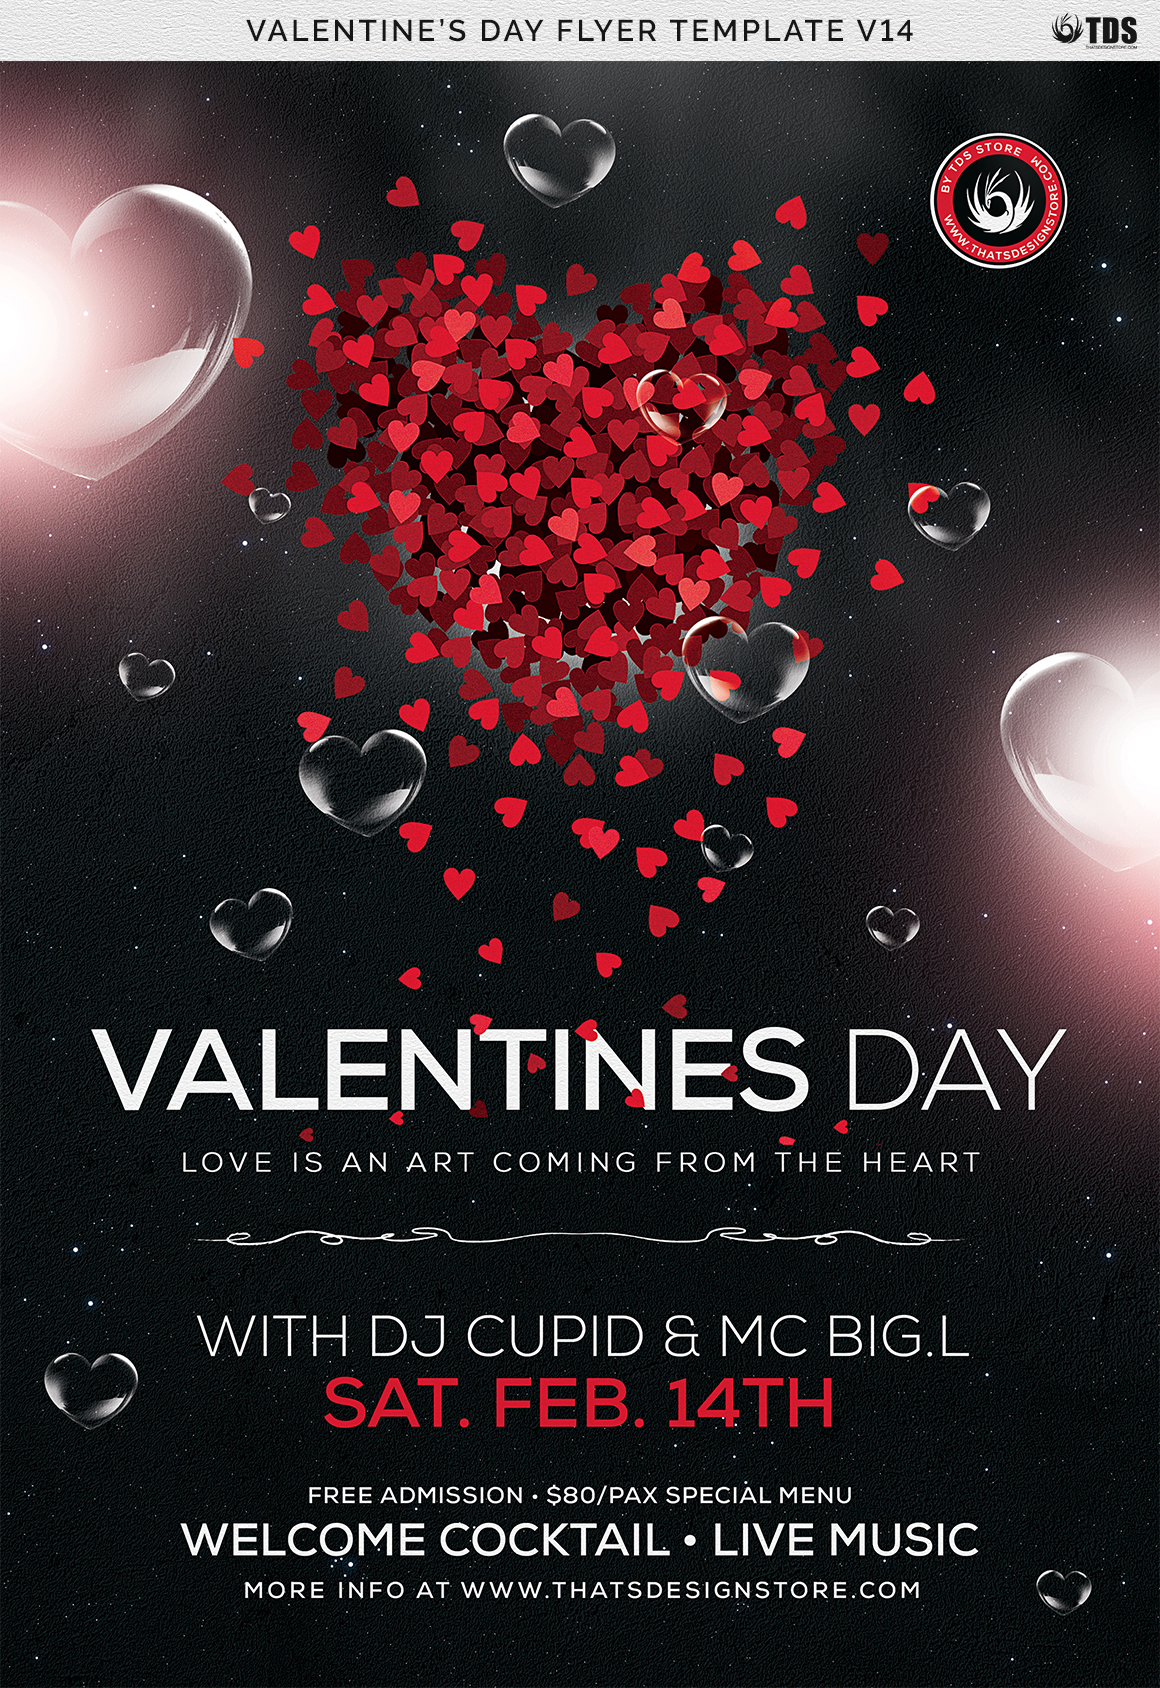 valentines day flyer template v14